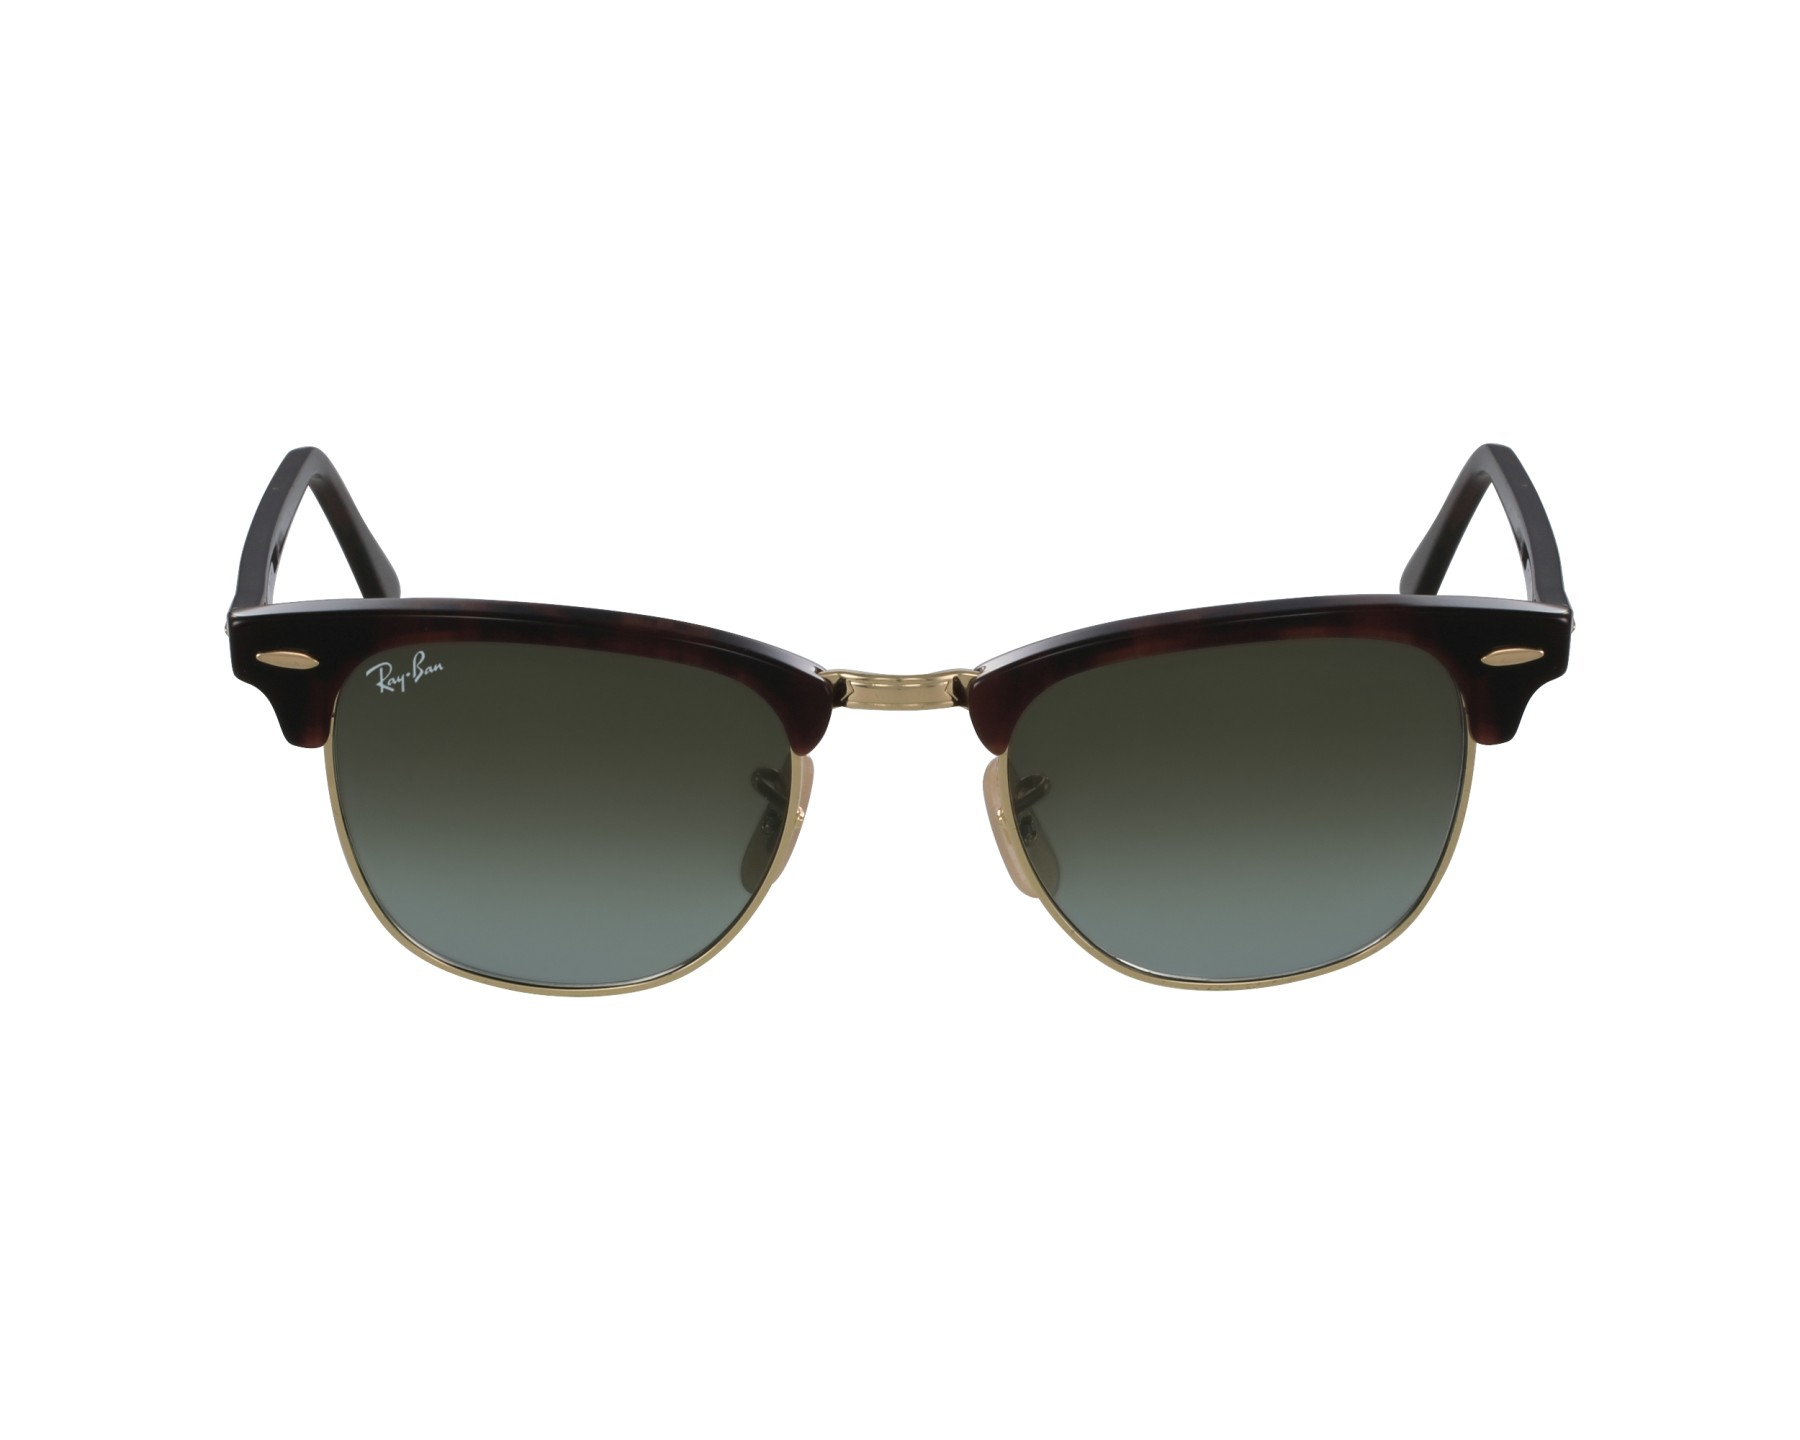 ec558ba3b8 Sunglasses Ray-Ban RB-3016 990 9J 49-21 Havana Gold profile